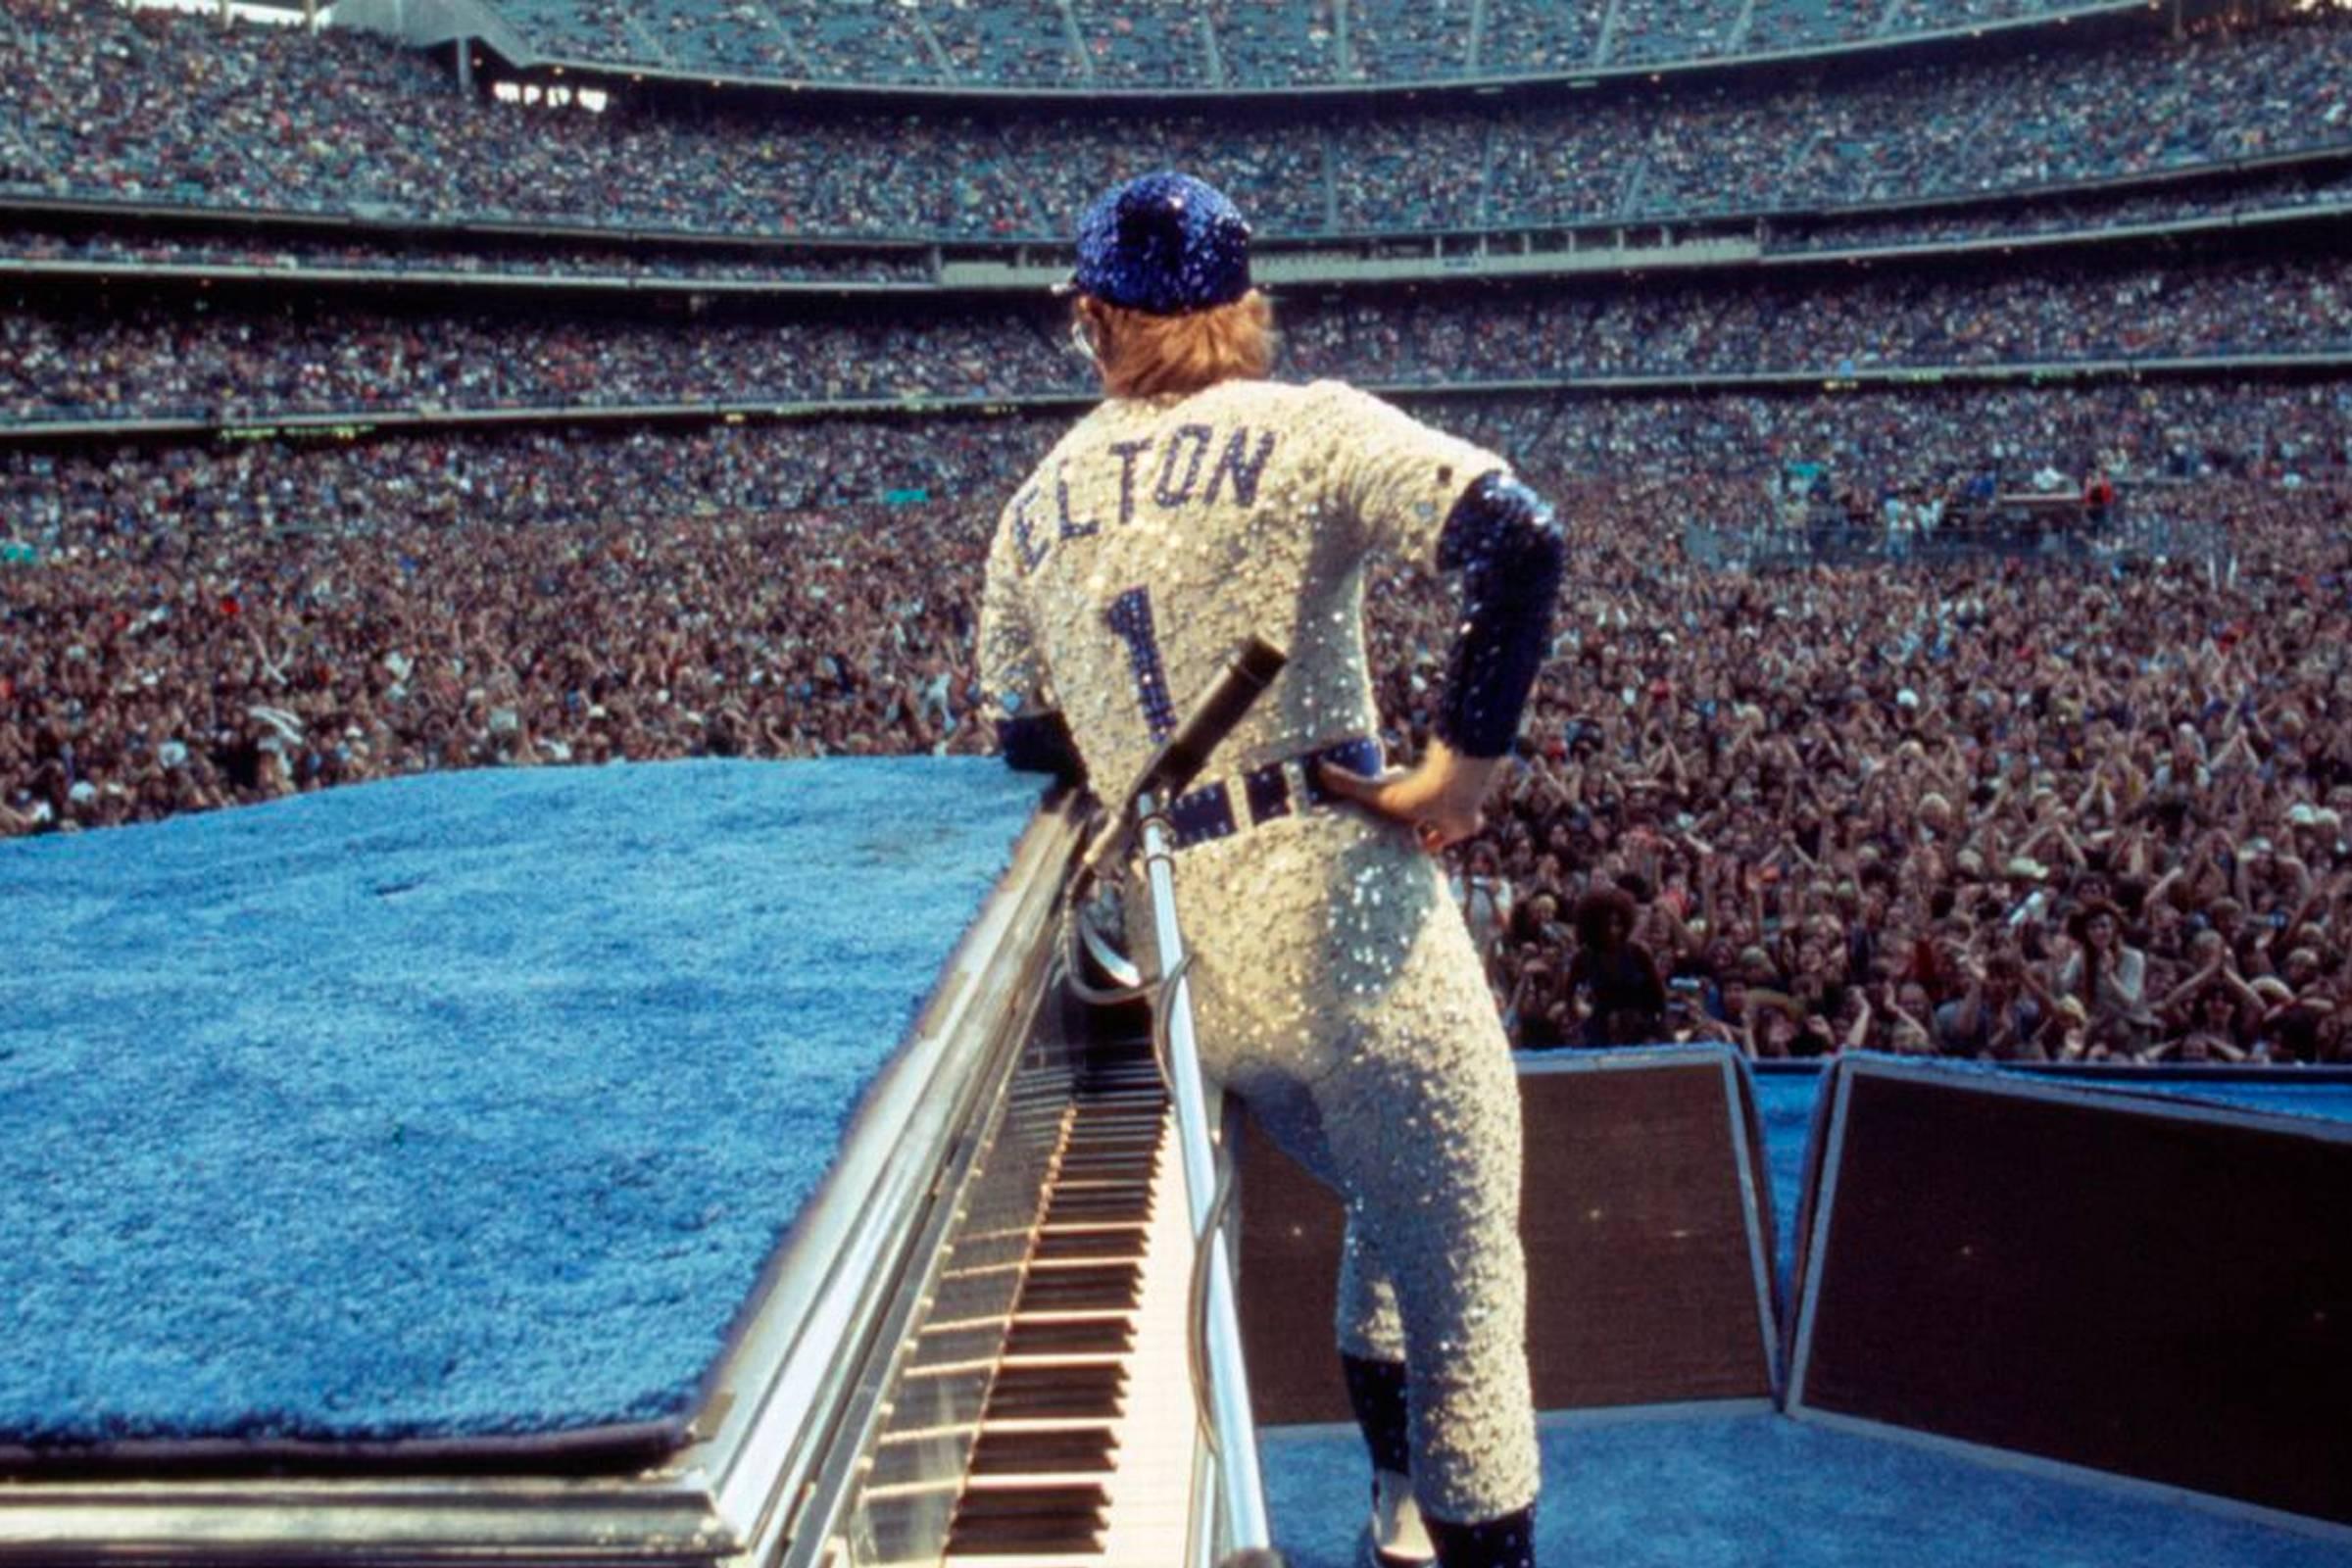 Elton John performing at Dodgers Stadium in LA, 1975